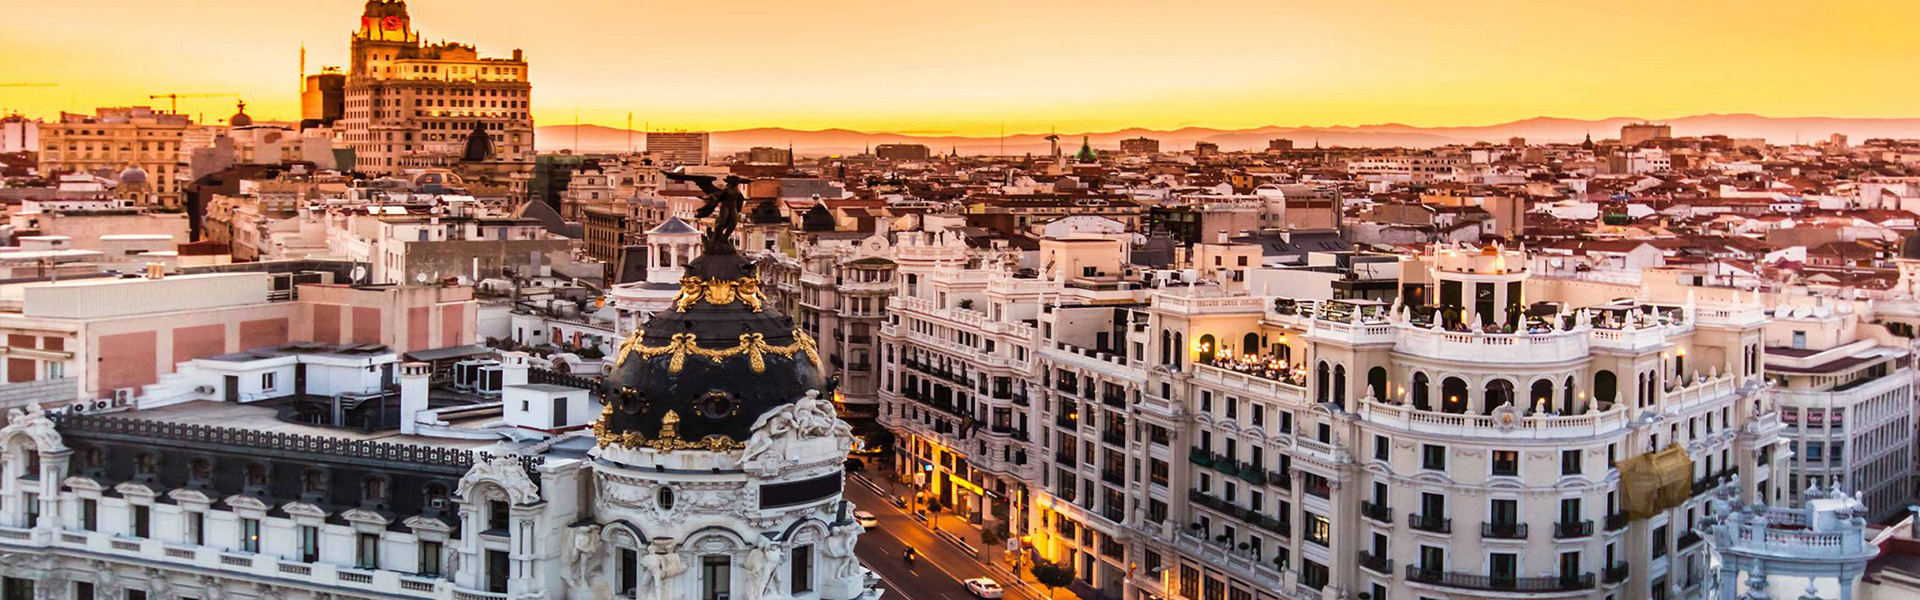 MADRID 08. novembar